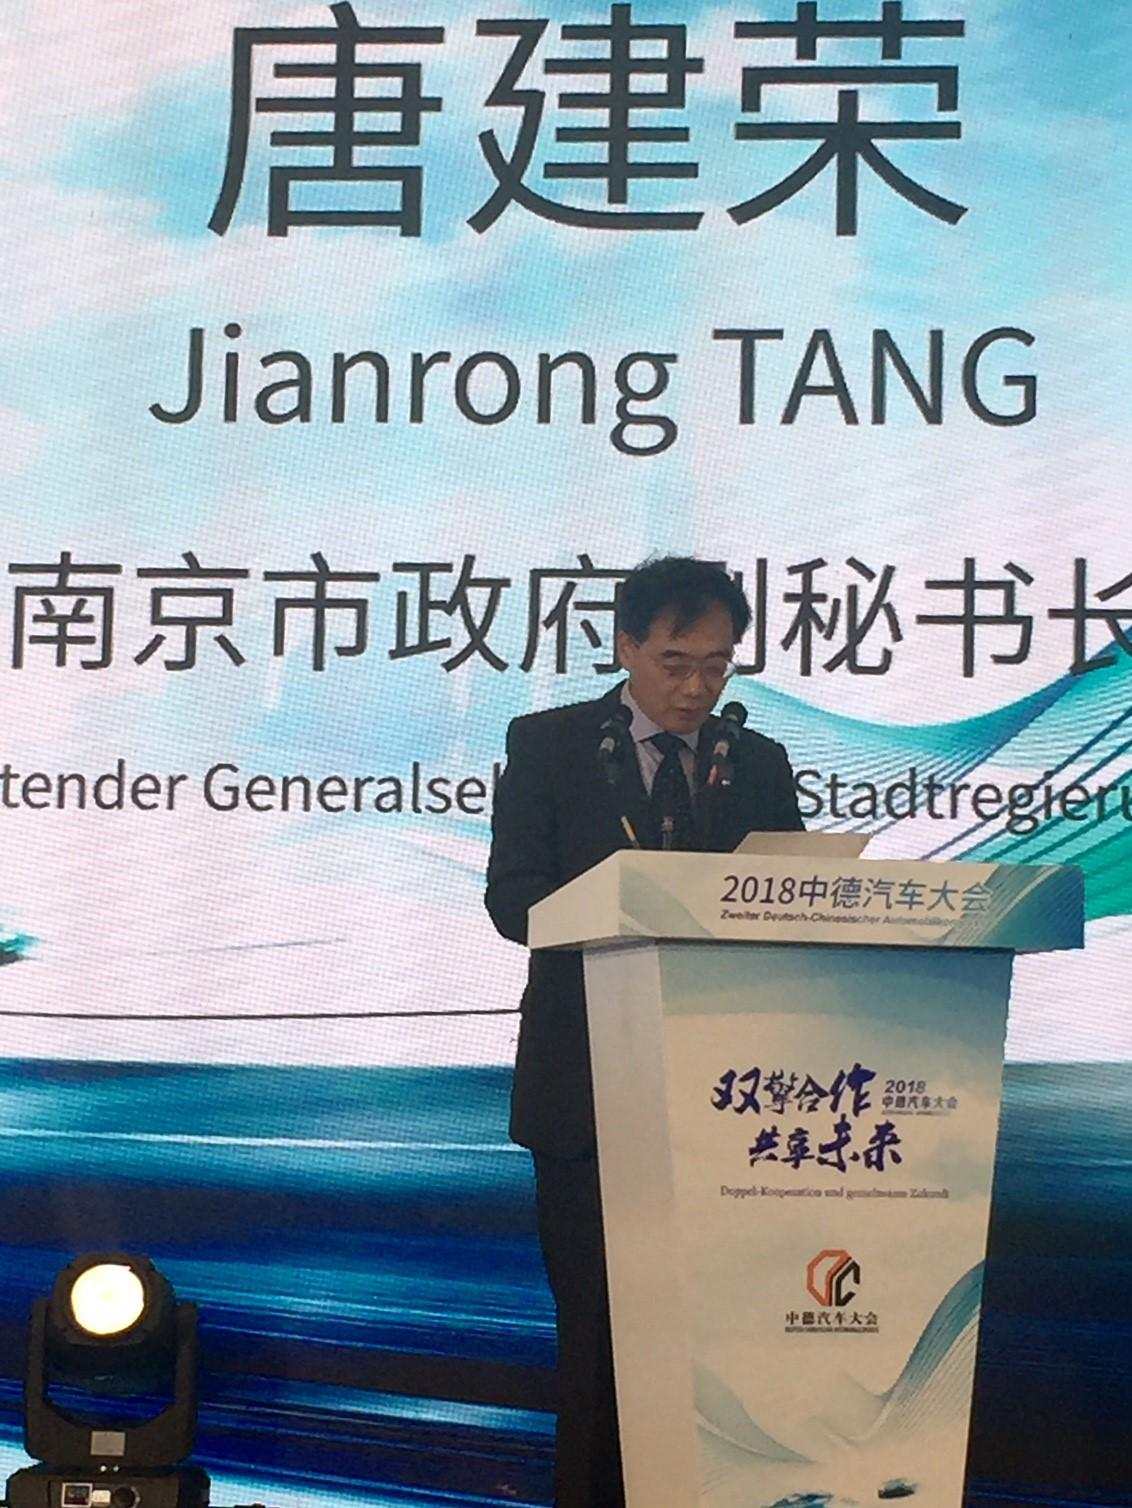 Generalsekretär TANG (Nanjing)